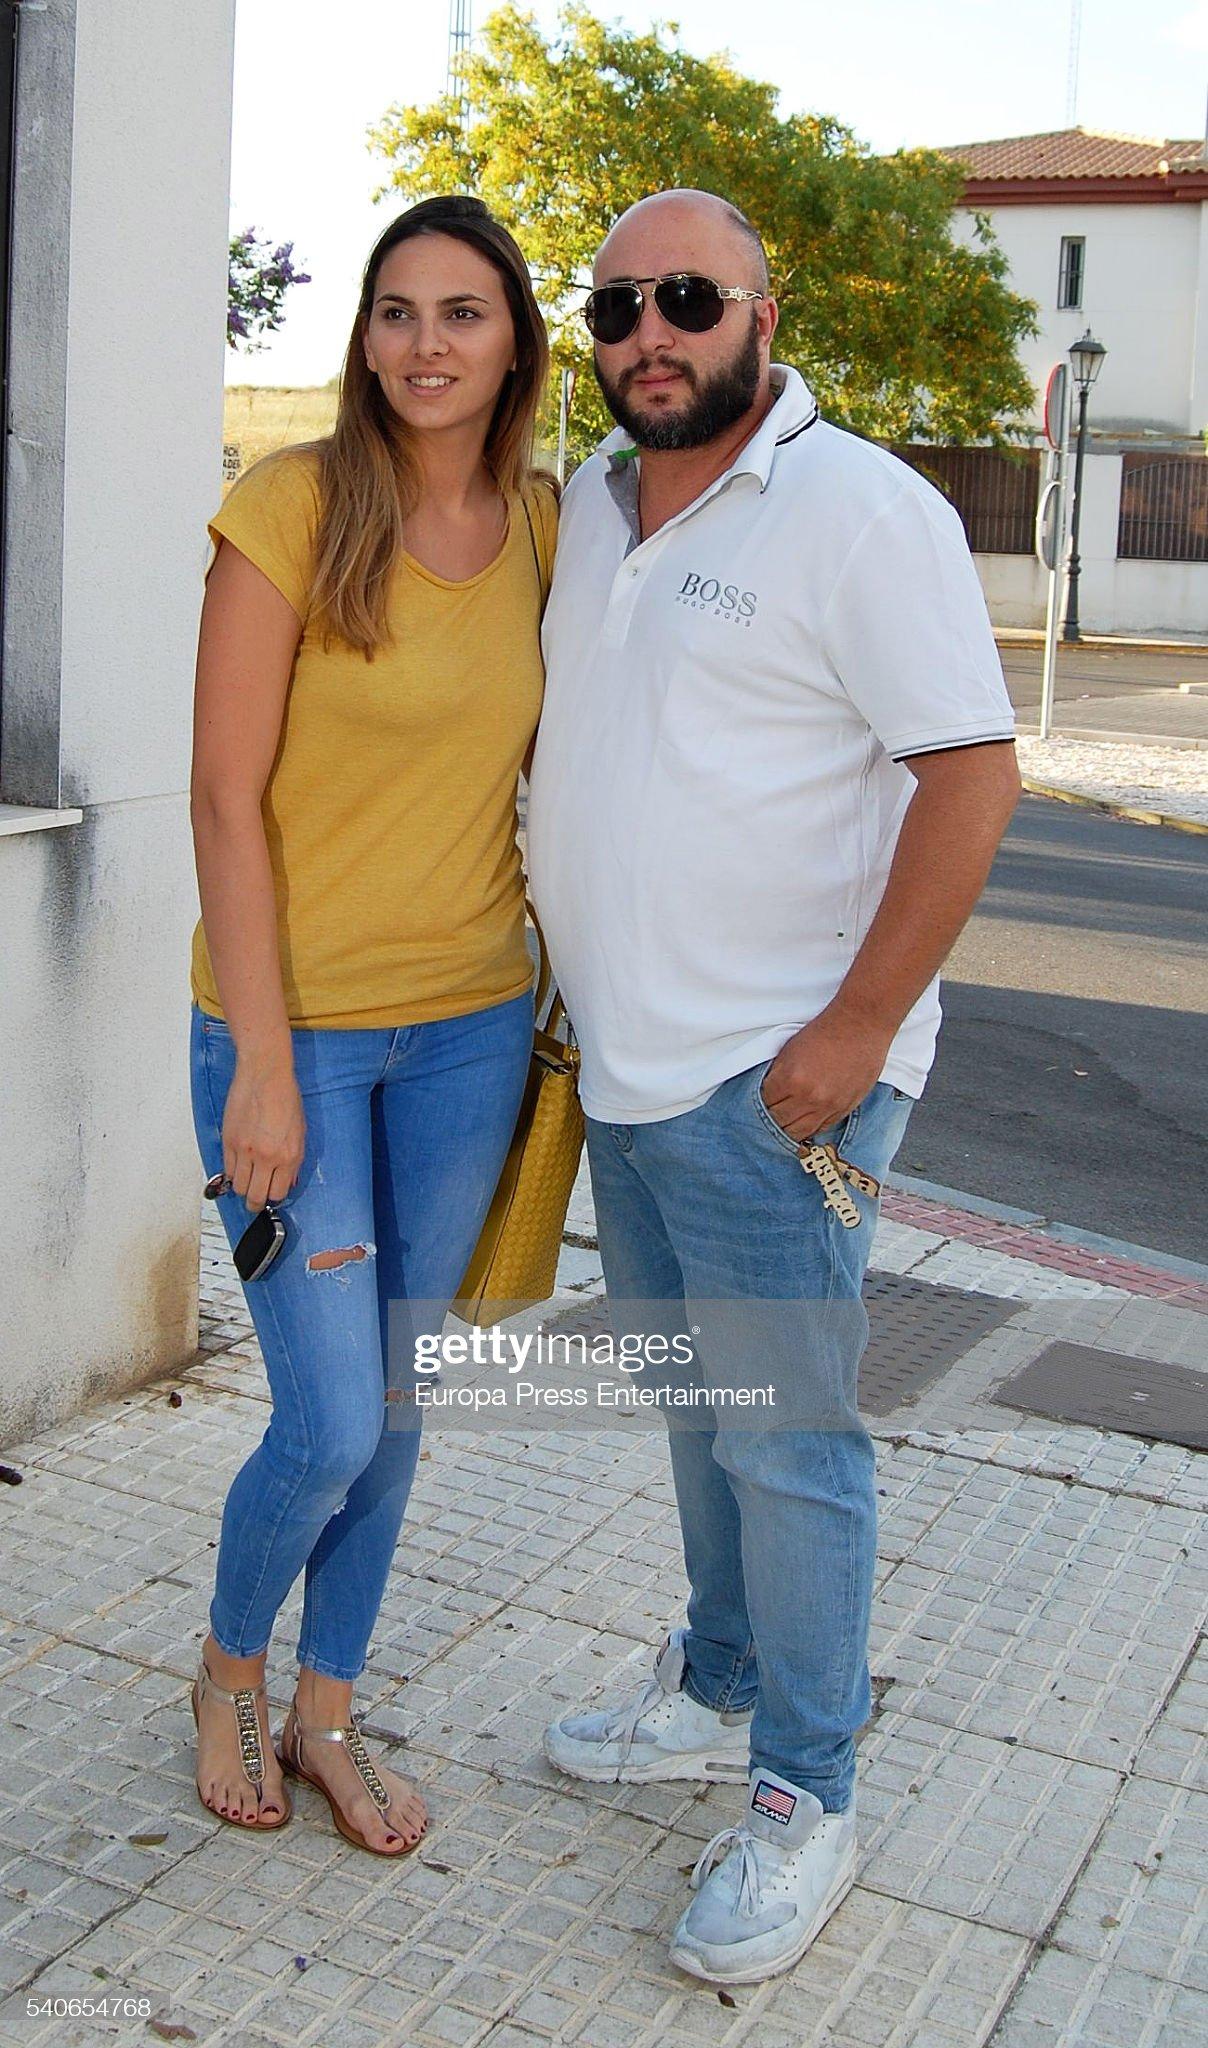 ¿Cuánto mide Irene Rosales? Dj-kiko-rivera-and-his-girlfriend-irene-rosales-pose-the-day-of-irene-picture-id540654768?s=2048x2048